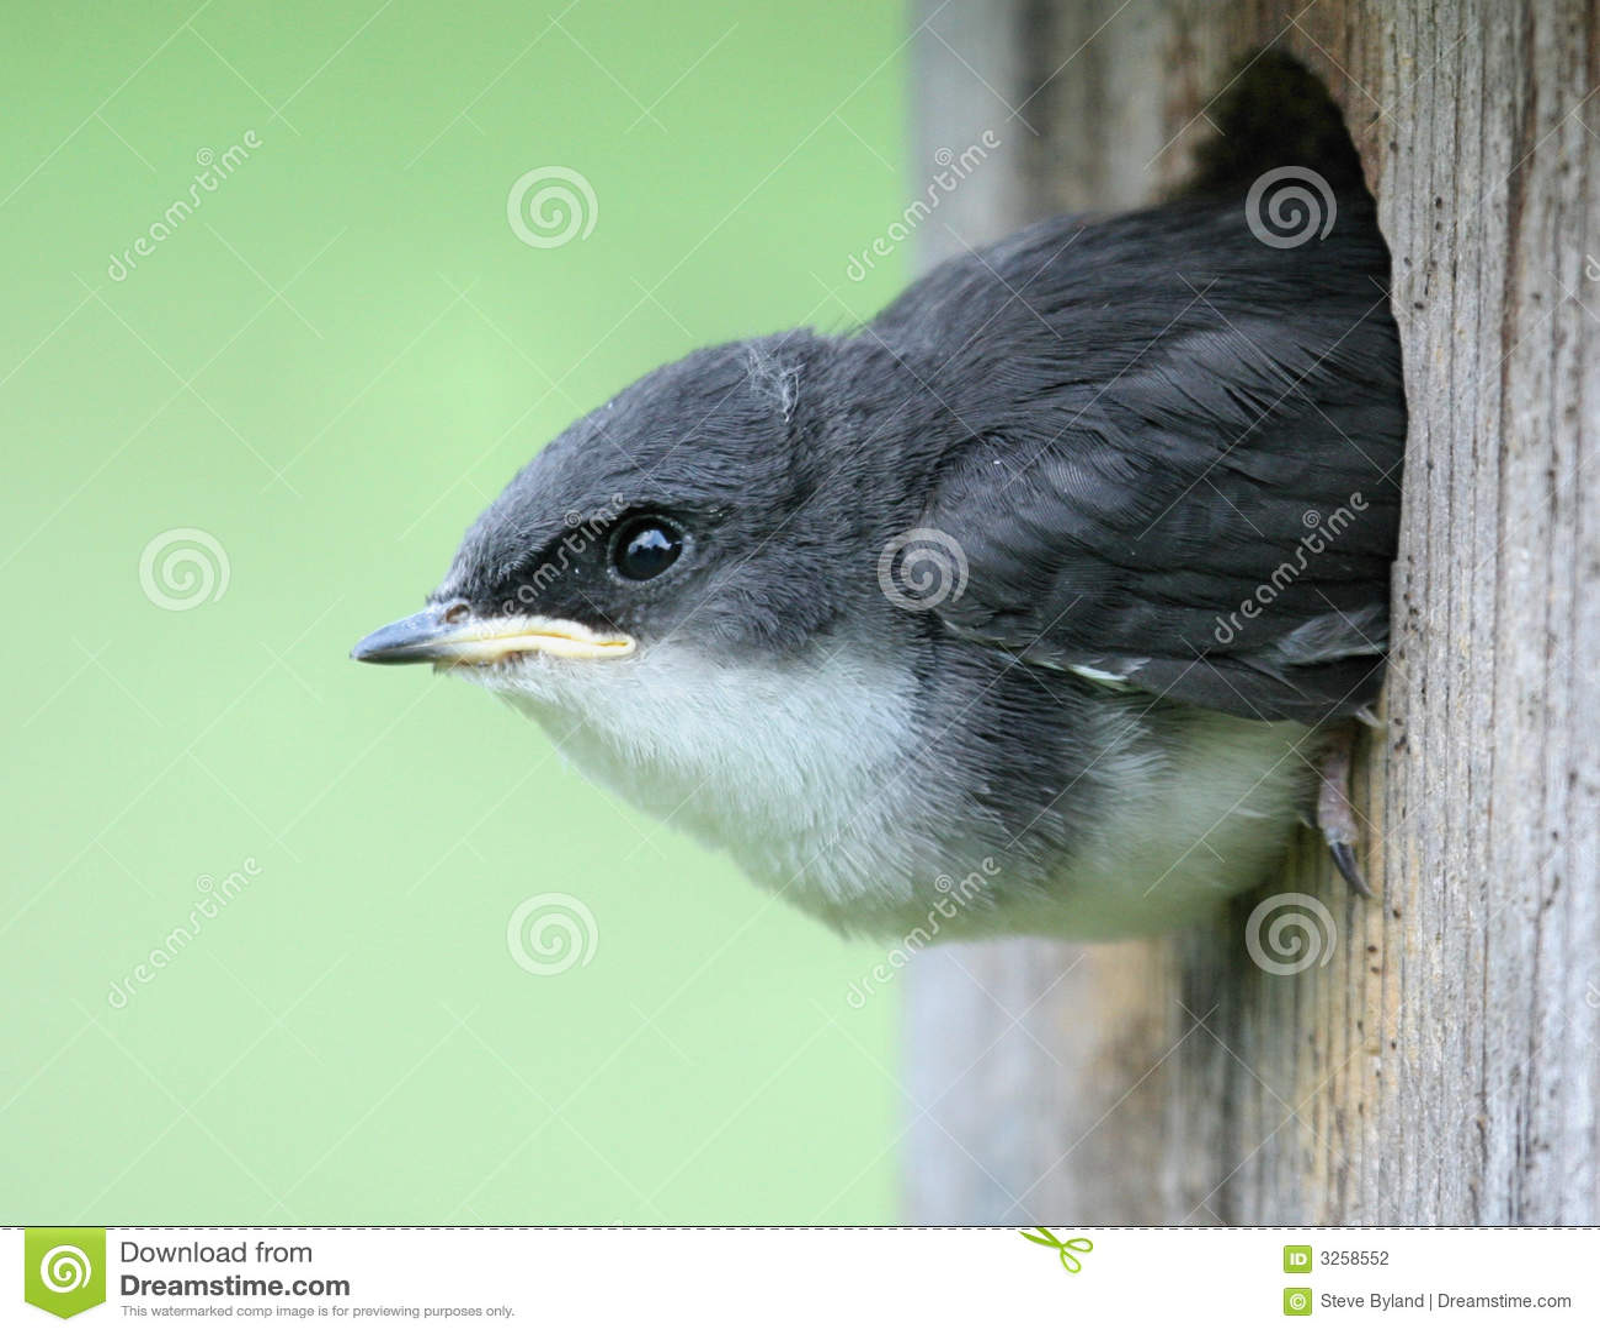 Baby Bird - Tree Swallow